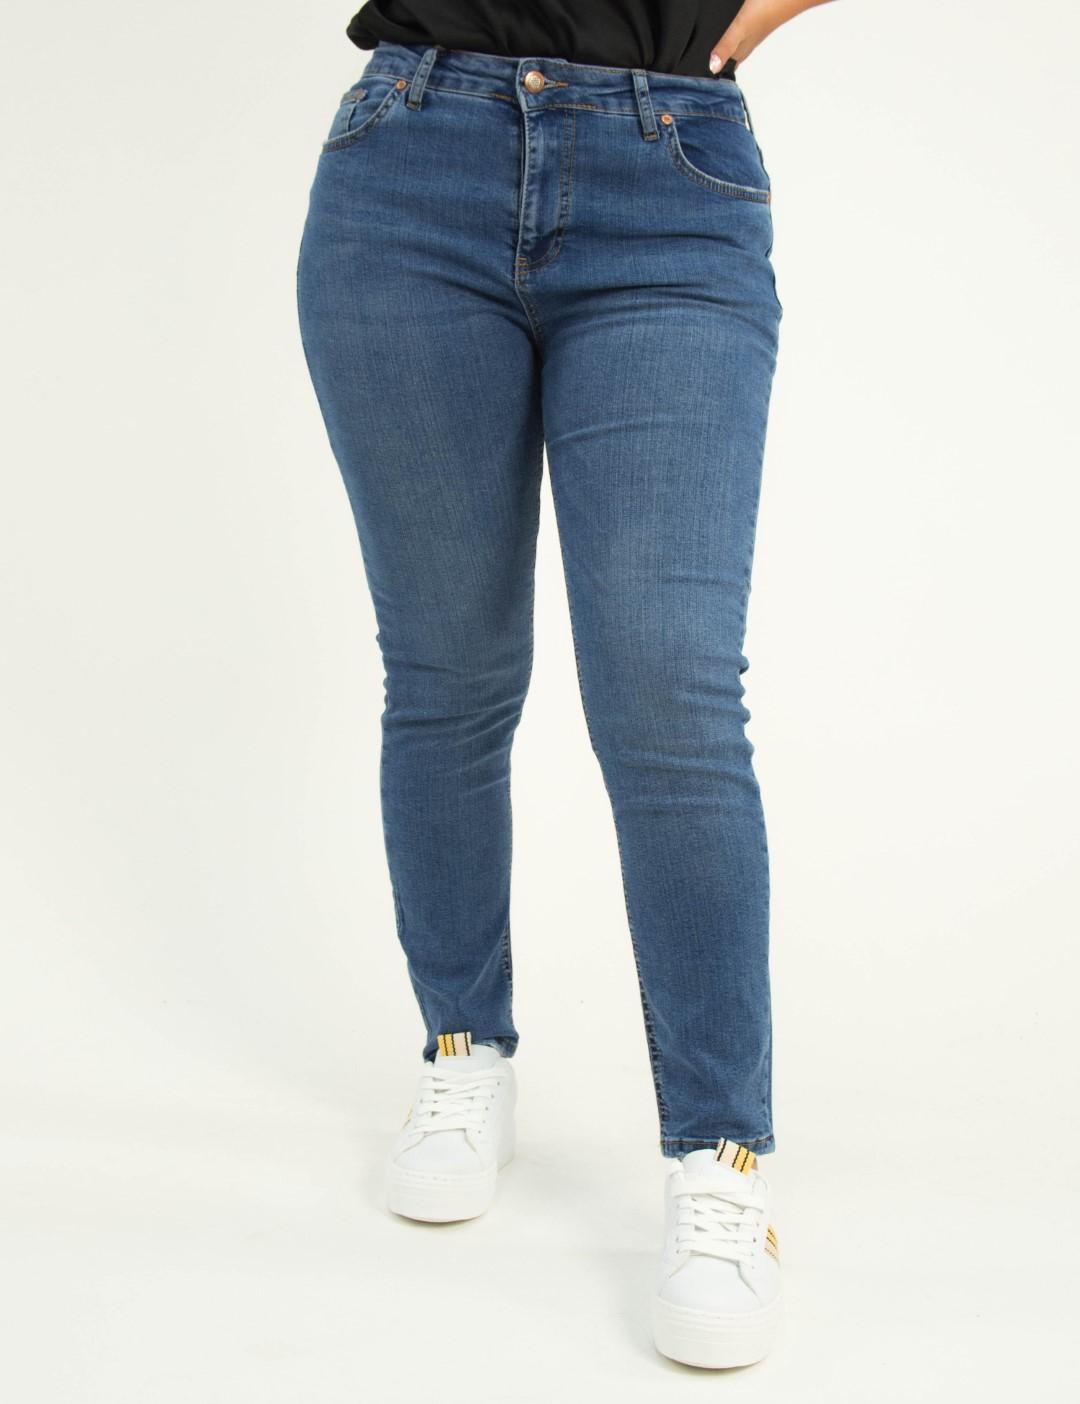 774be8ebacc ΓΥΝΑΙΚΑ ΓΥΝΑΙΚΕΙΑ ΡΟΥΧΑ ΠΑΝΤΕΛΟΝΙΑ Τζήν Jeans | 2